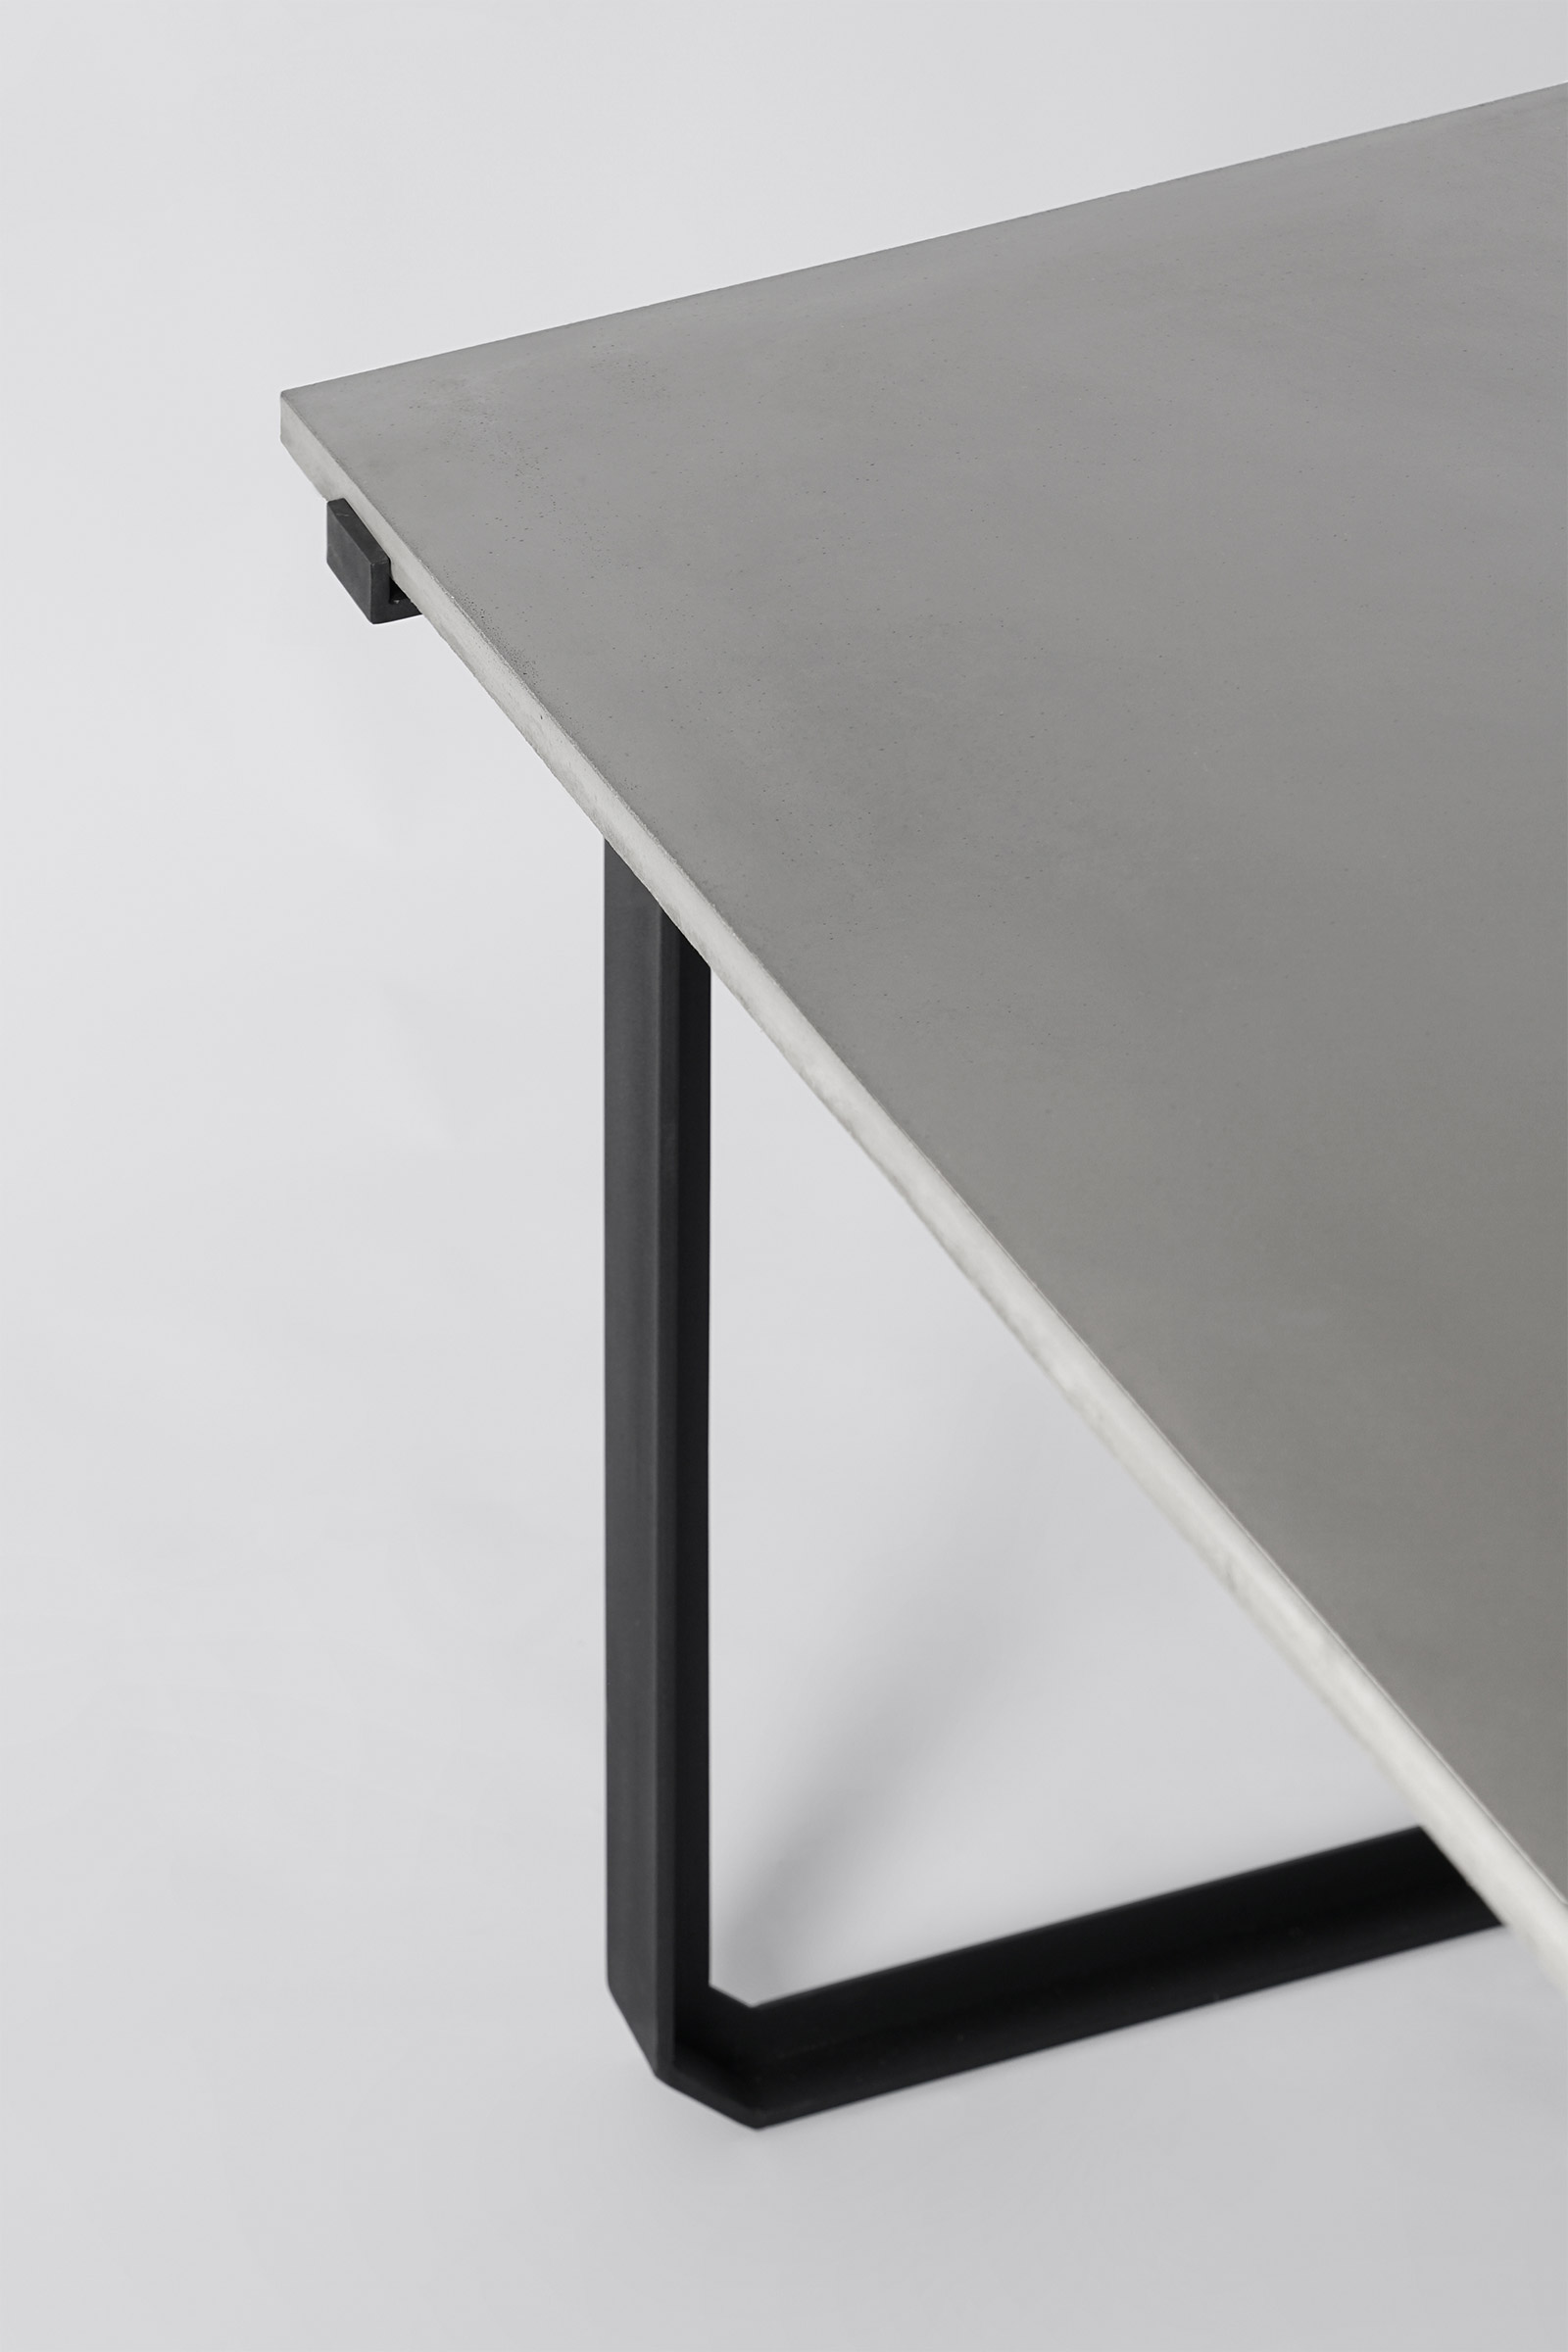 concrete and black metal Nian desk by Bentu